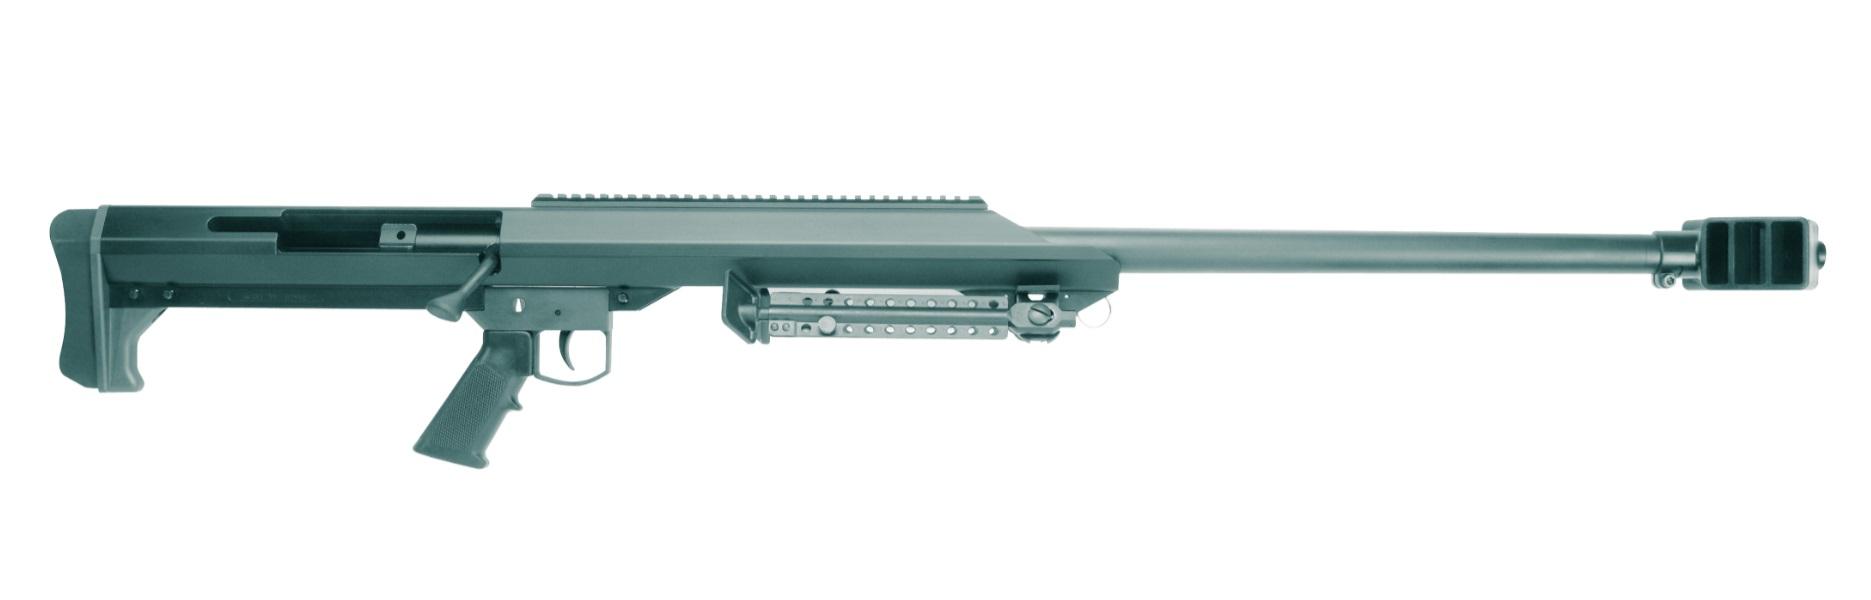 Barrett Firearms MODEL 99 416 BARRETT